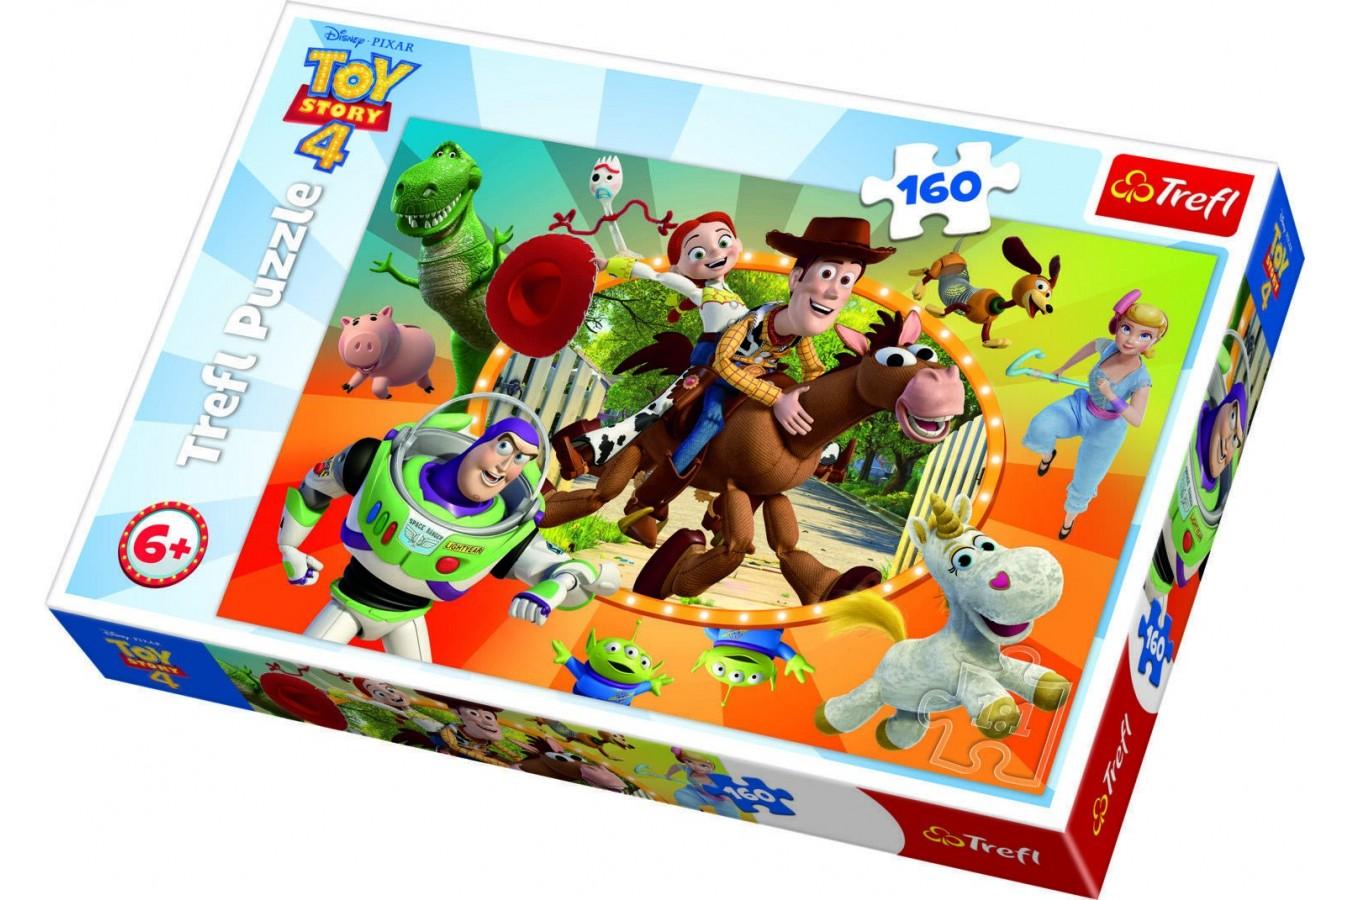 Puzzle Trefl - Toy Story 4, 160 piese (15367) imagine